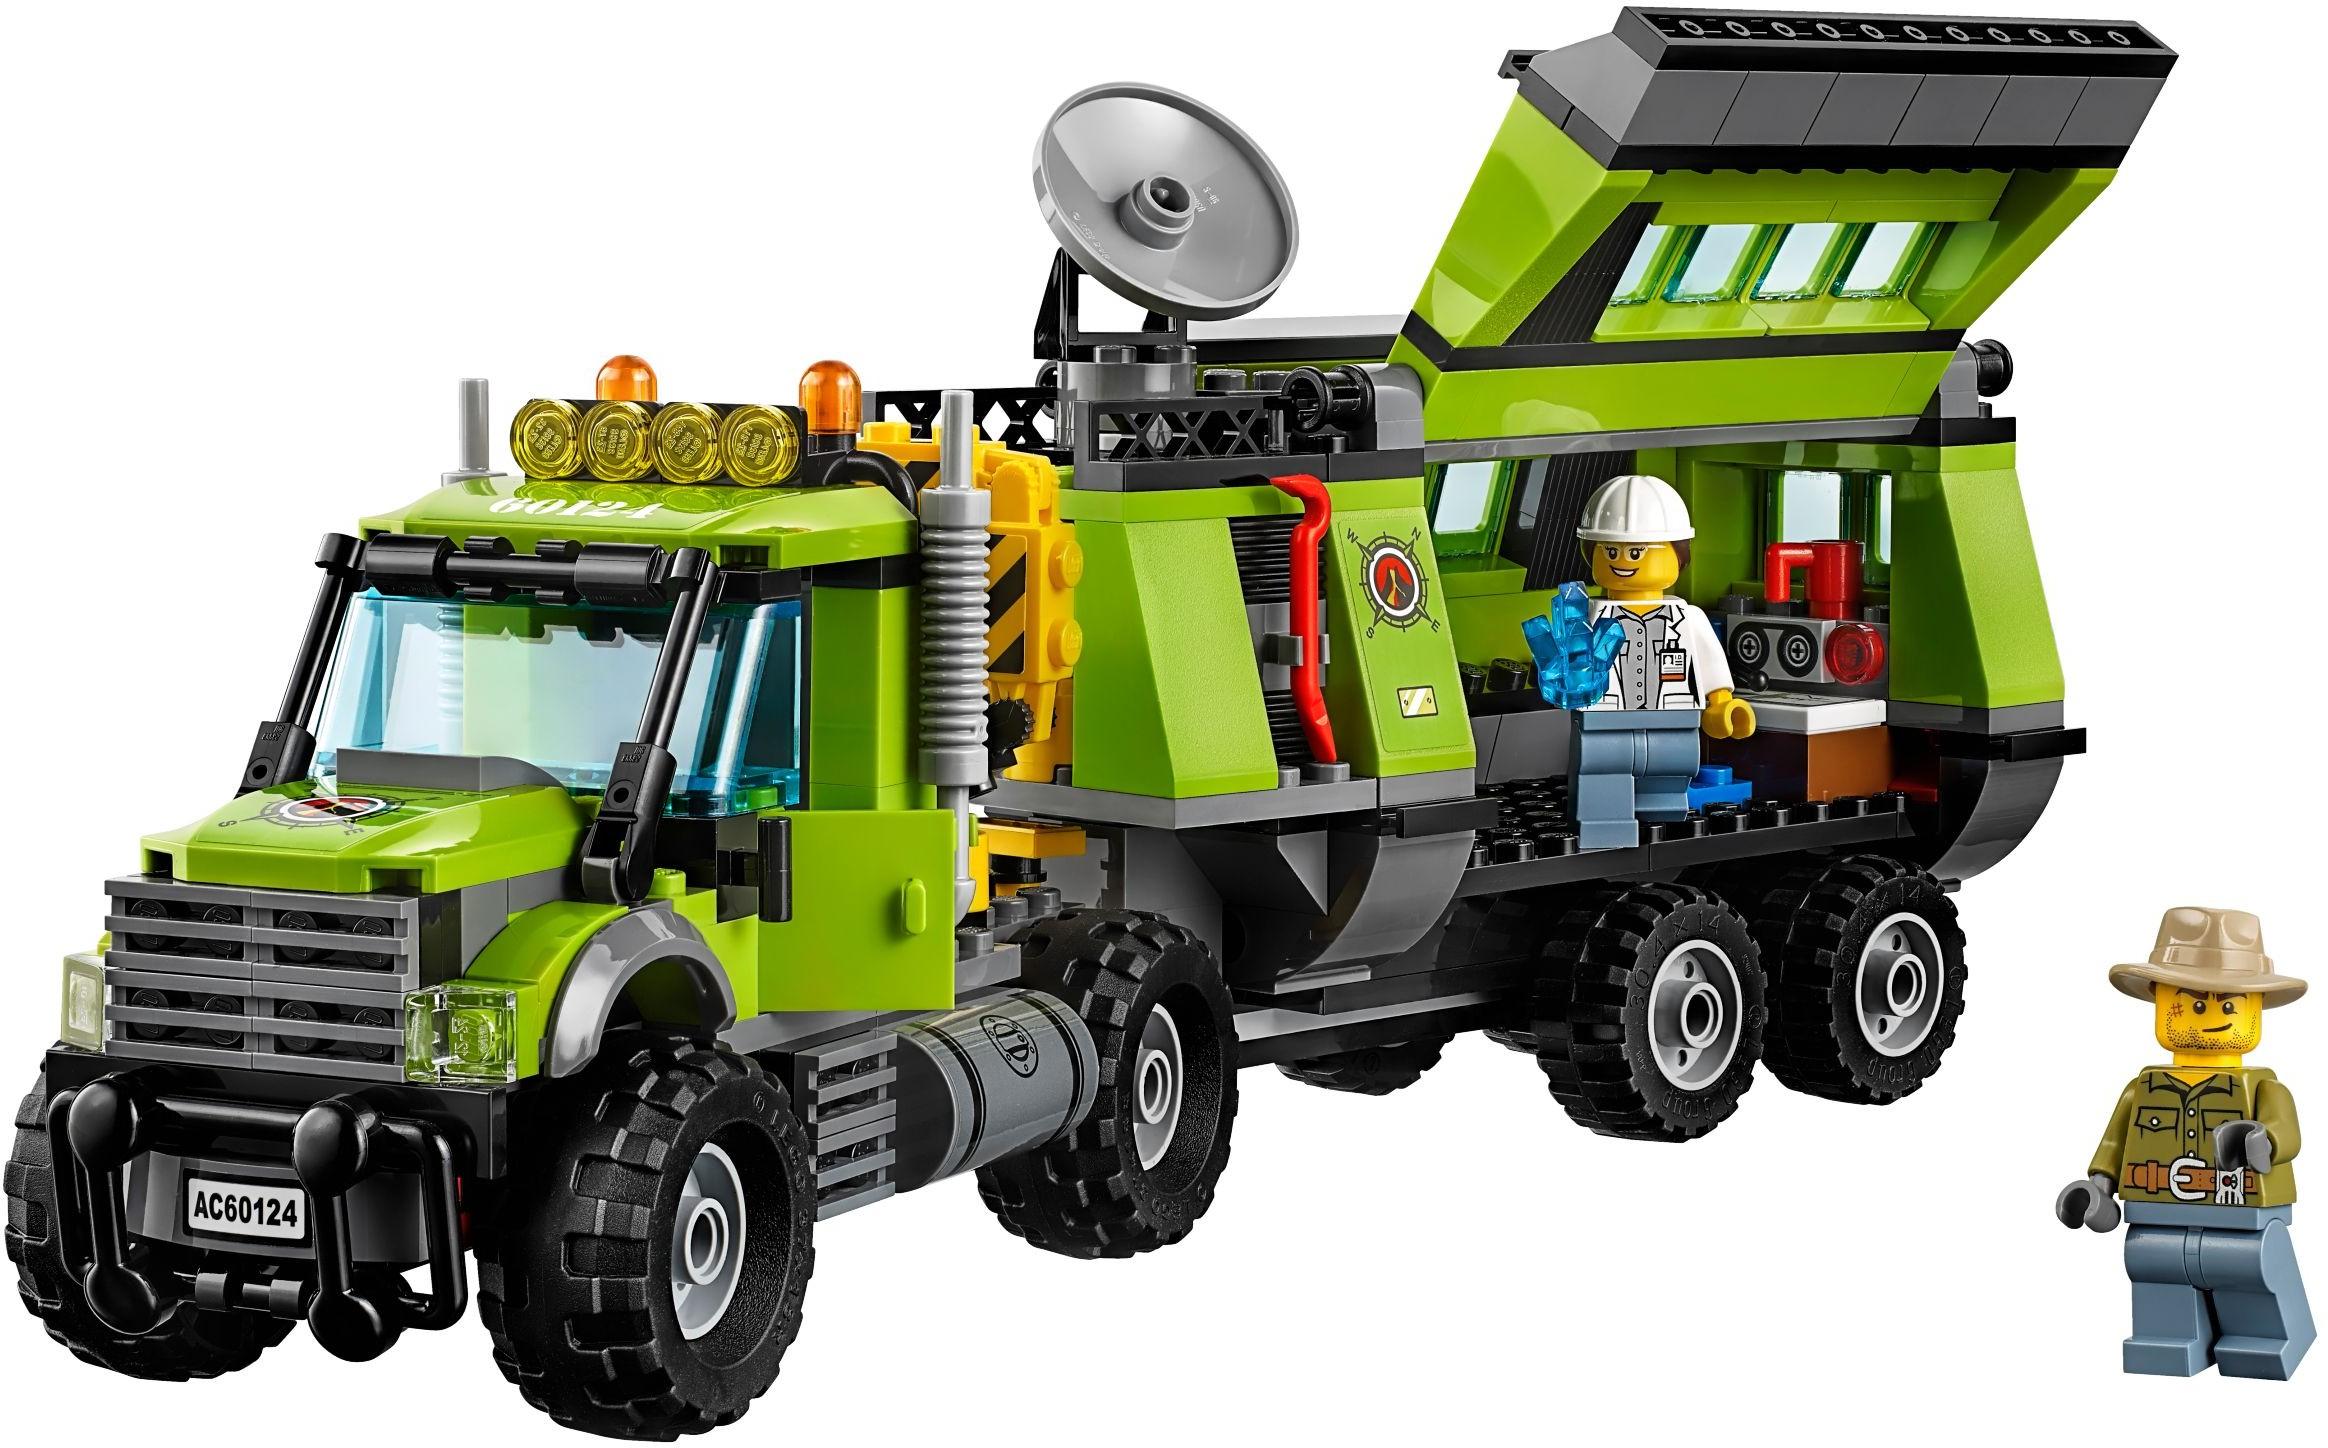 Lego Base Lego 60124 Base Exploration 60124 Volcano Volcano Exploration W9EHD2IY